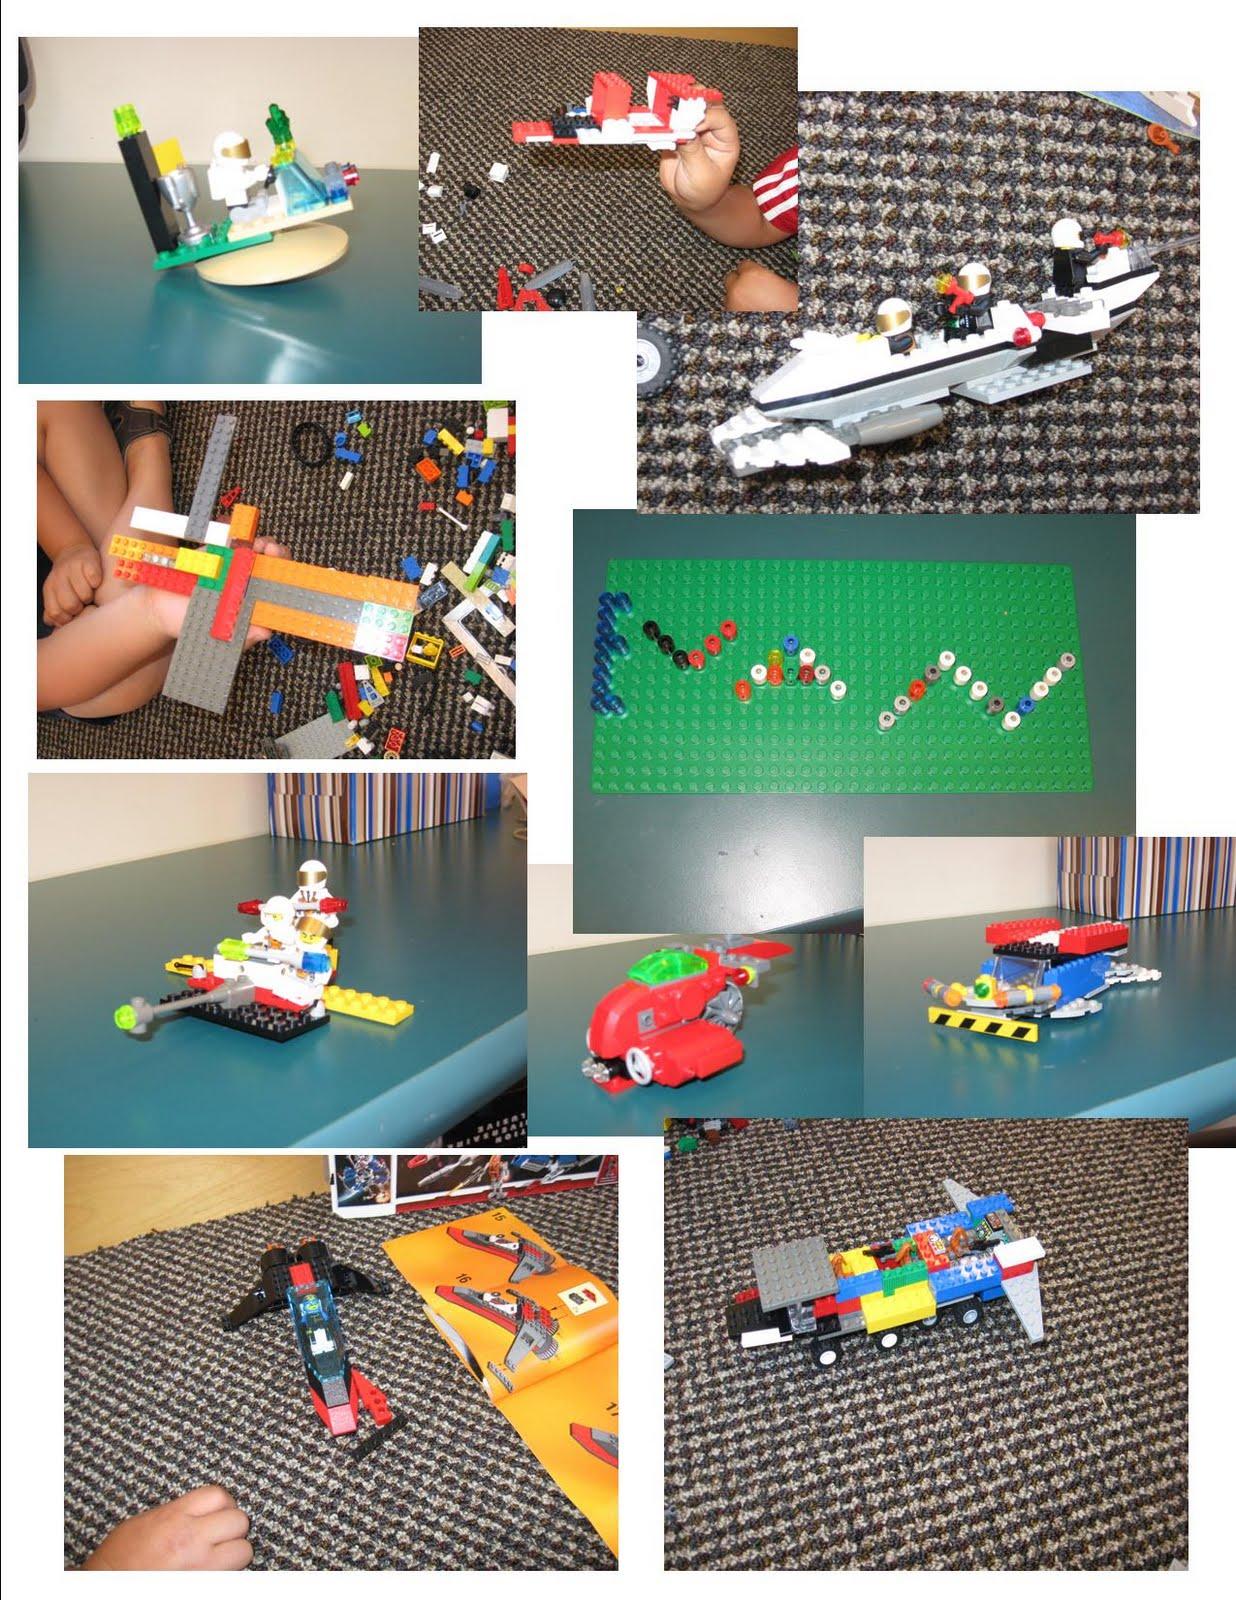 brick builders photos cool math games. Black Bedroom Furniture Sets. Home Design Ideas